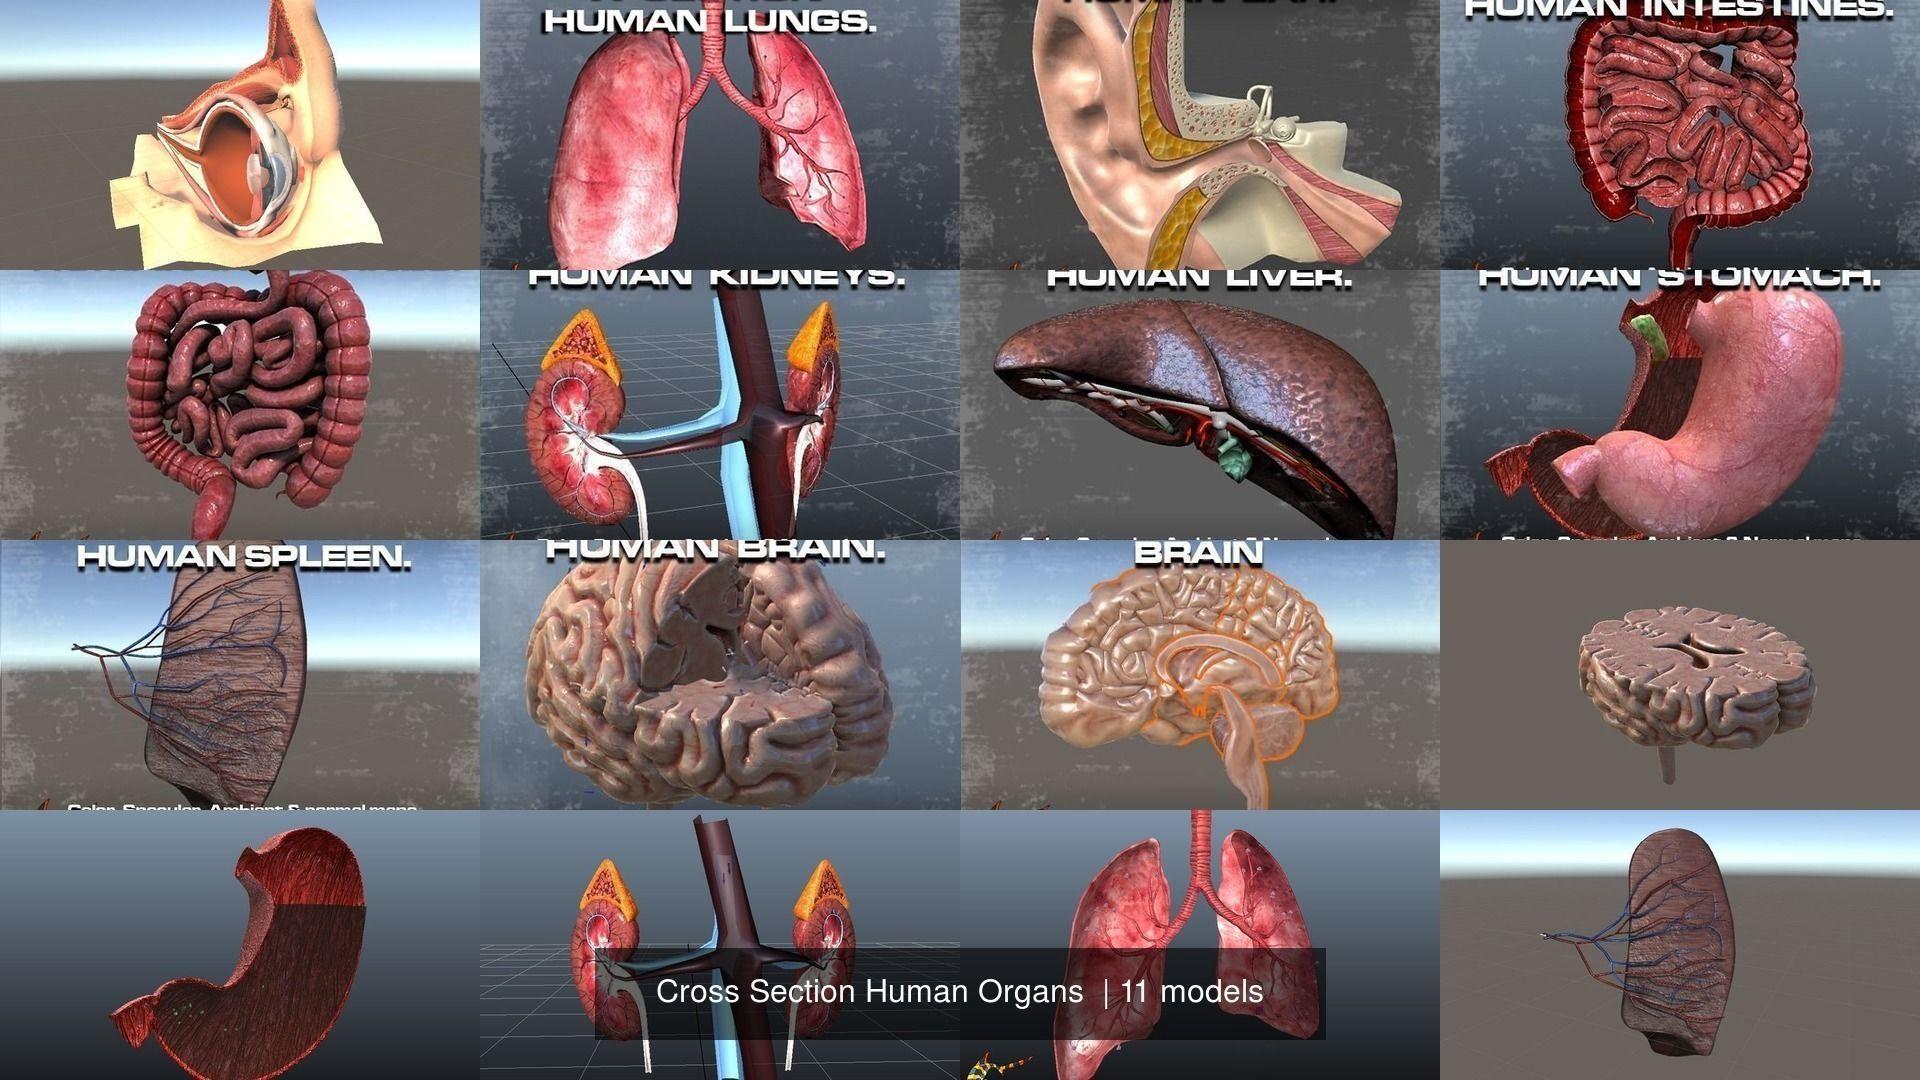 Cross Section Human Organs